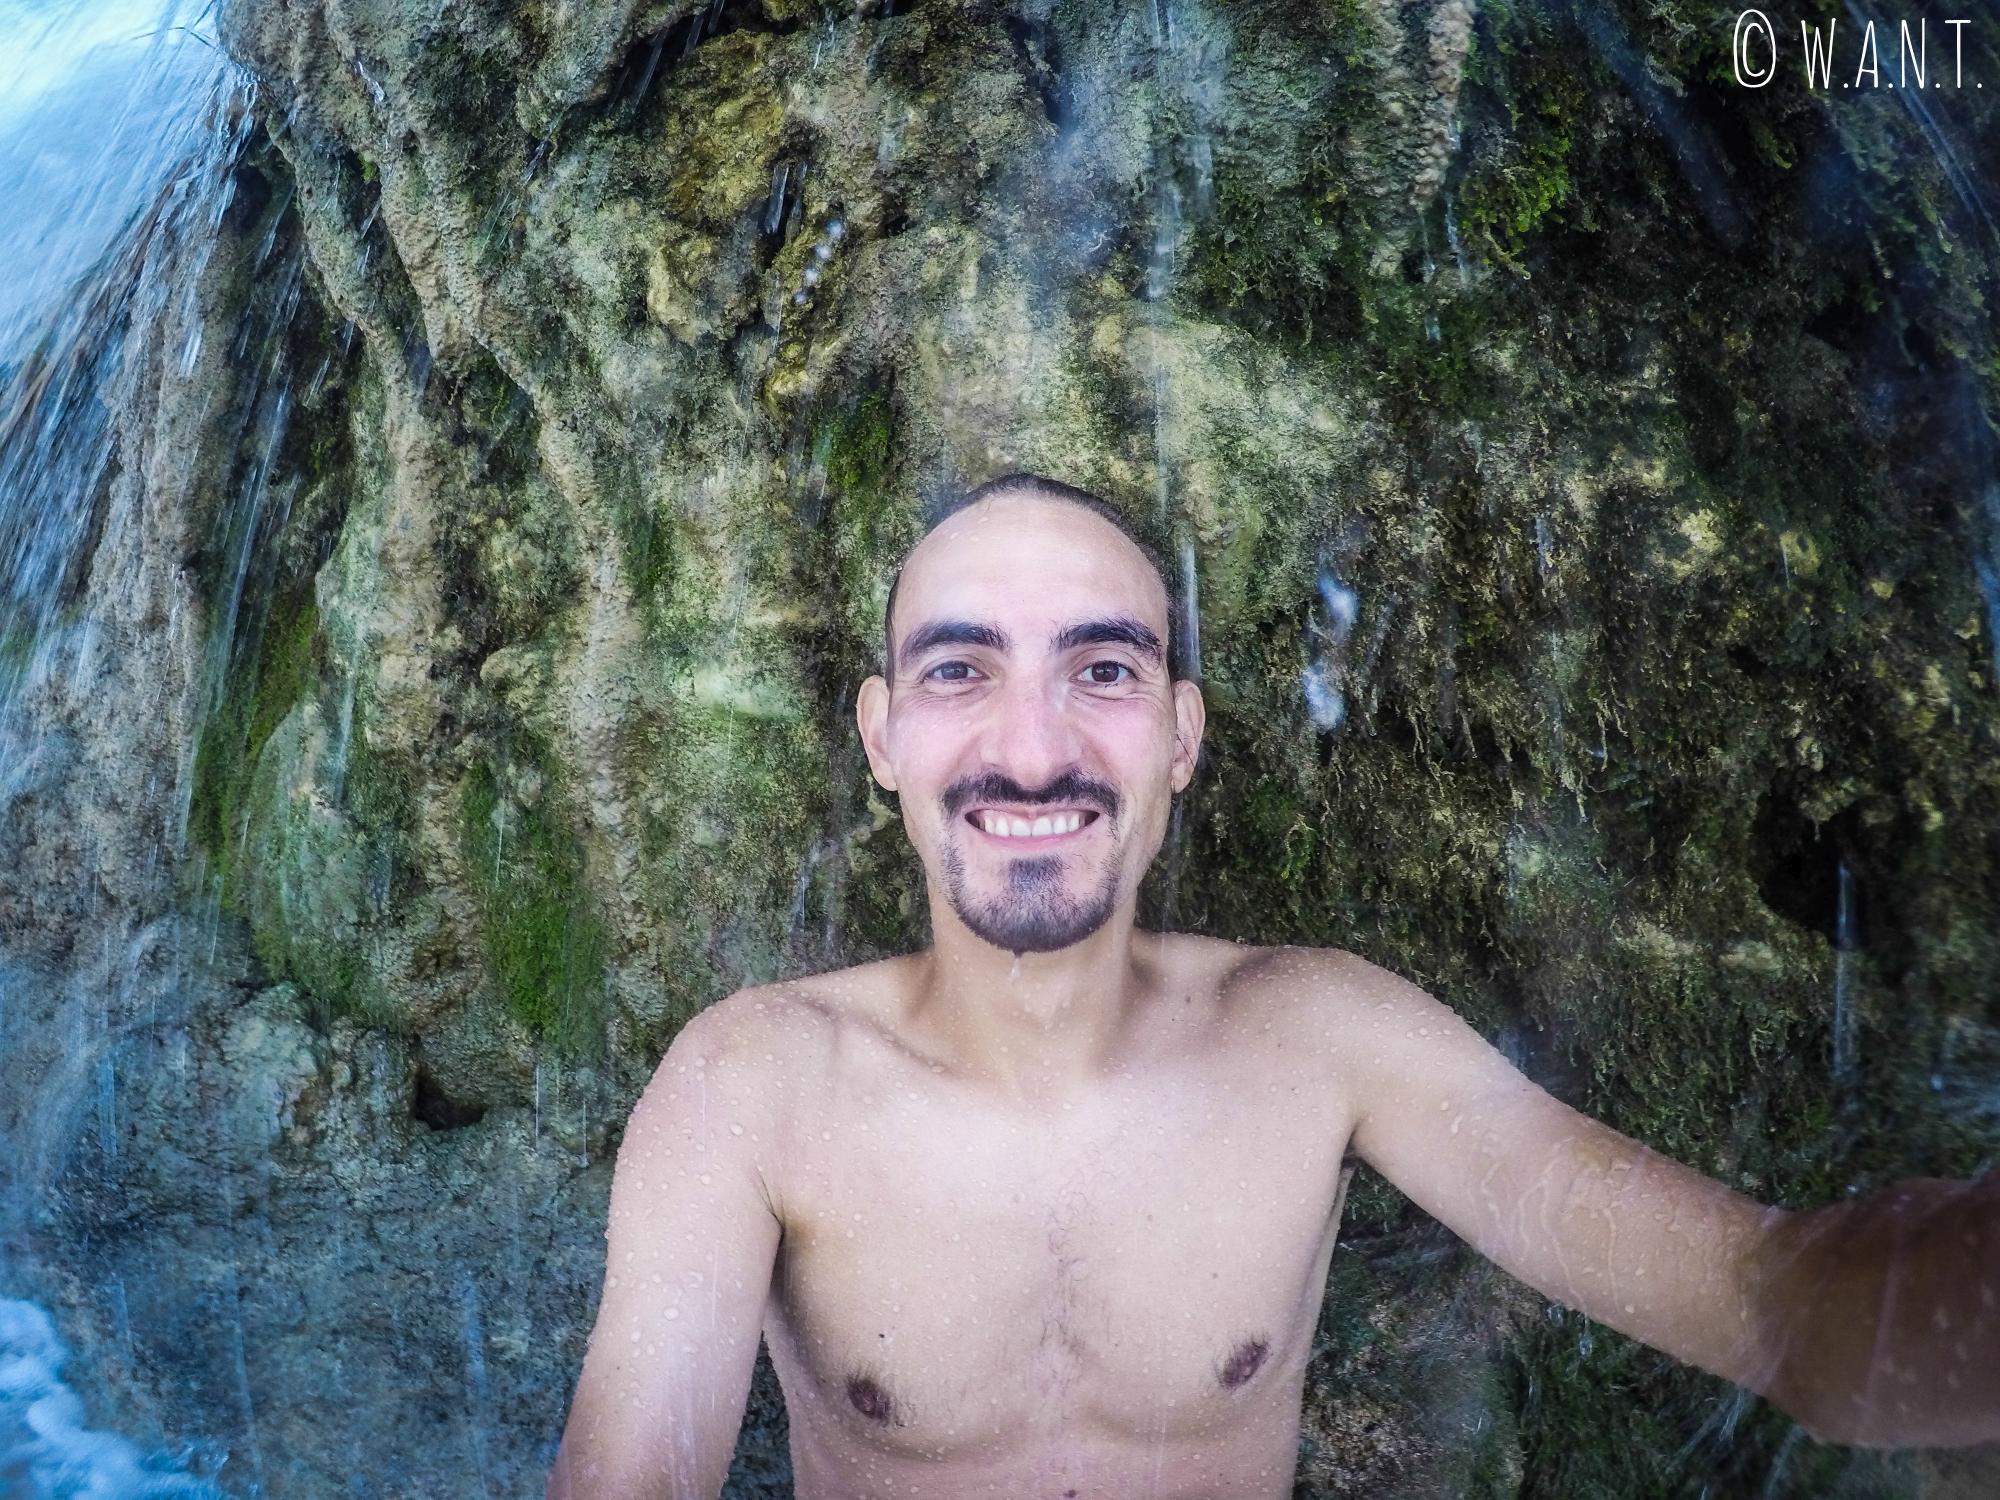 Benjamin est passé derrière le rideau d'eau de la cascade Kuang Si de Luang Prabang